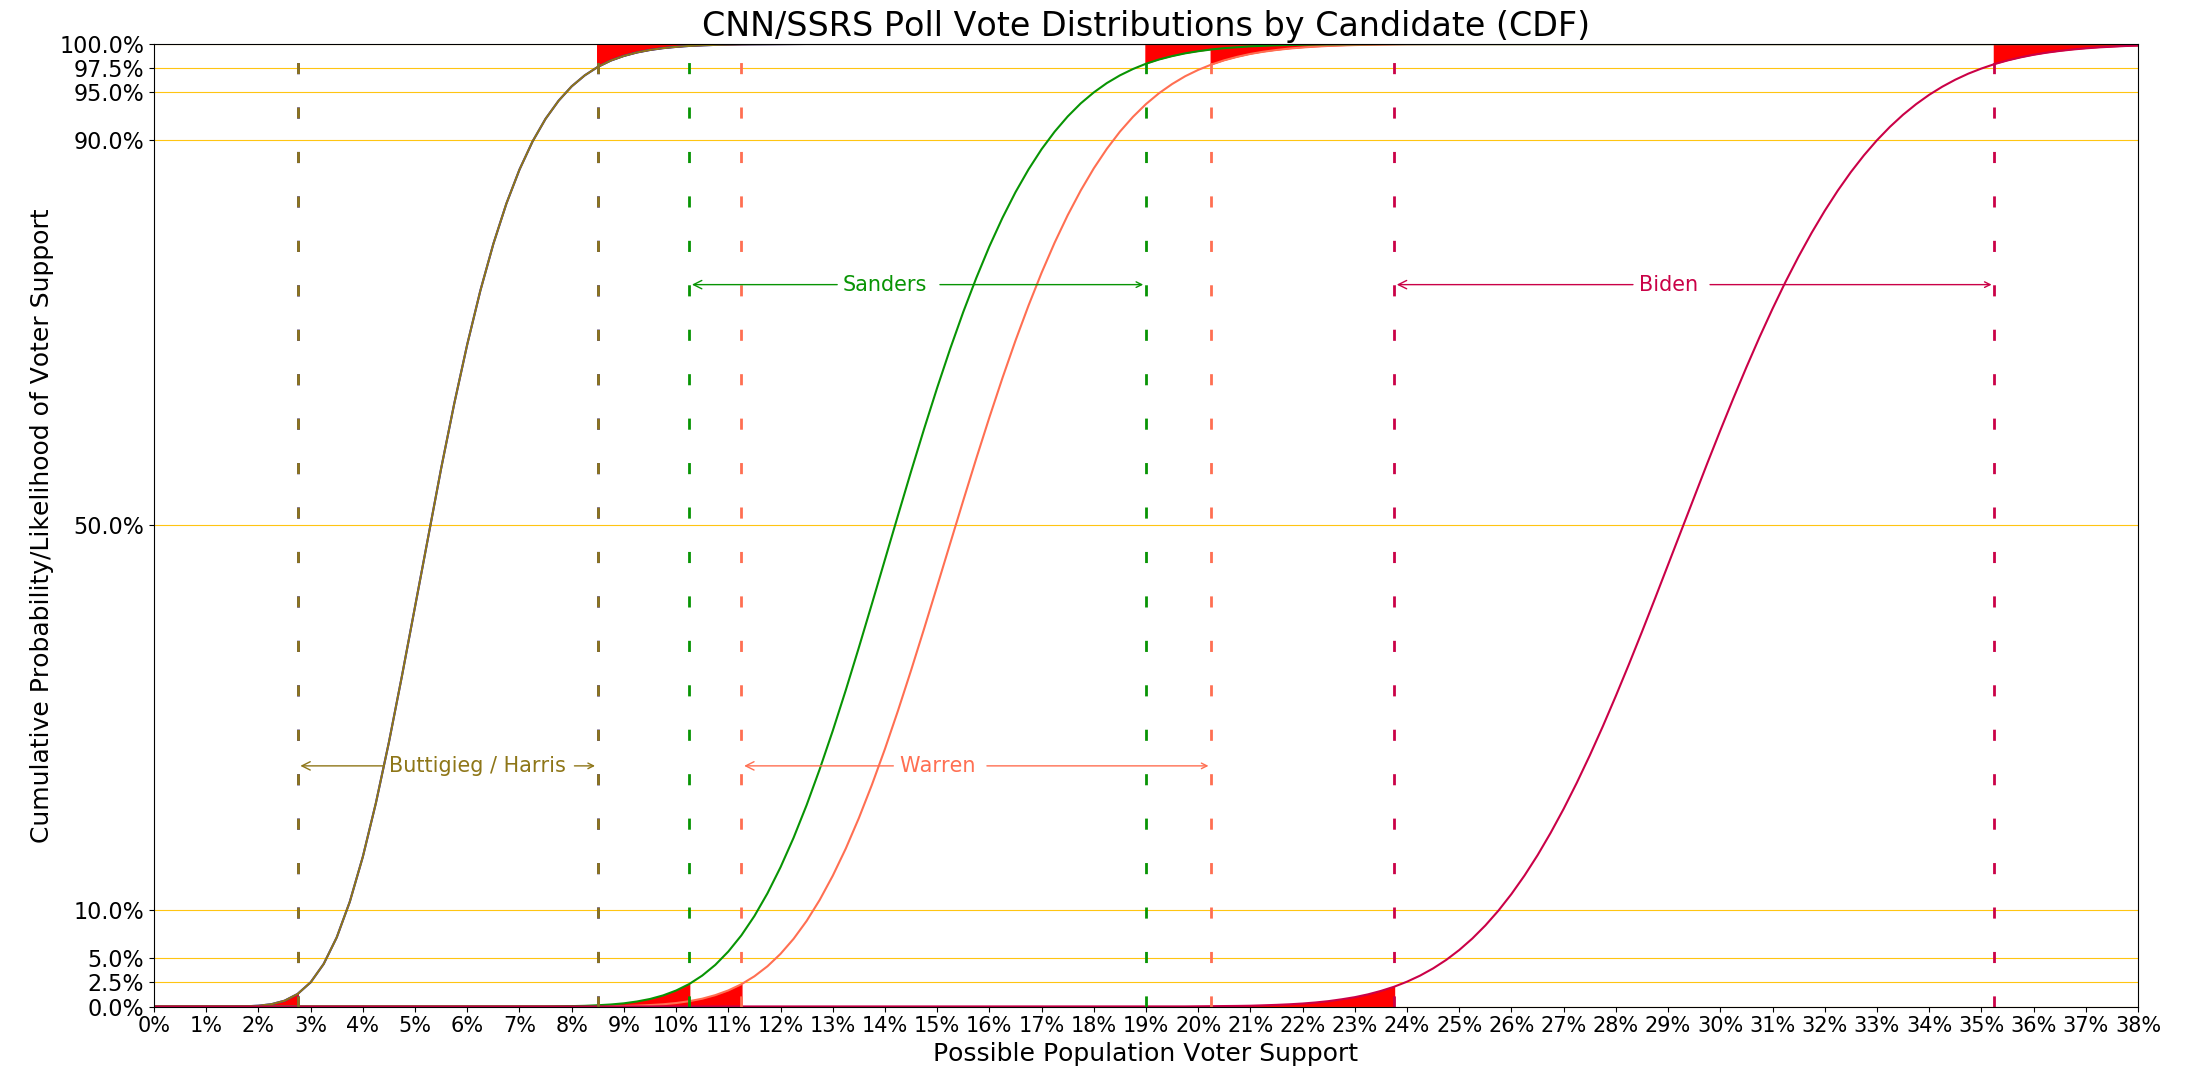 CNN SSRS distributions graph with DE